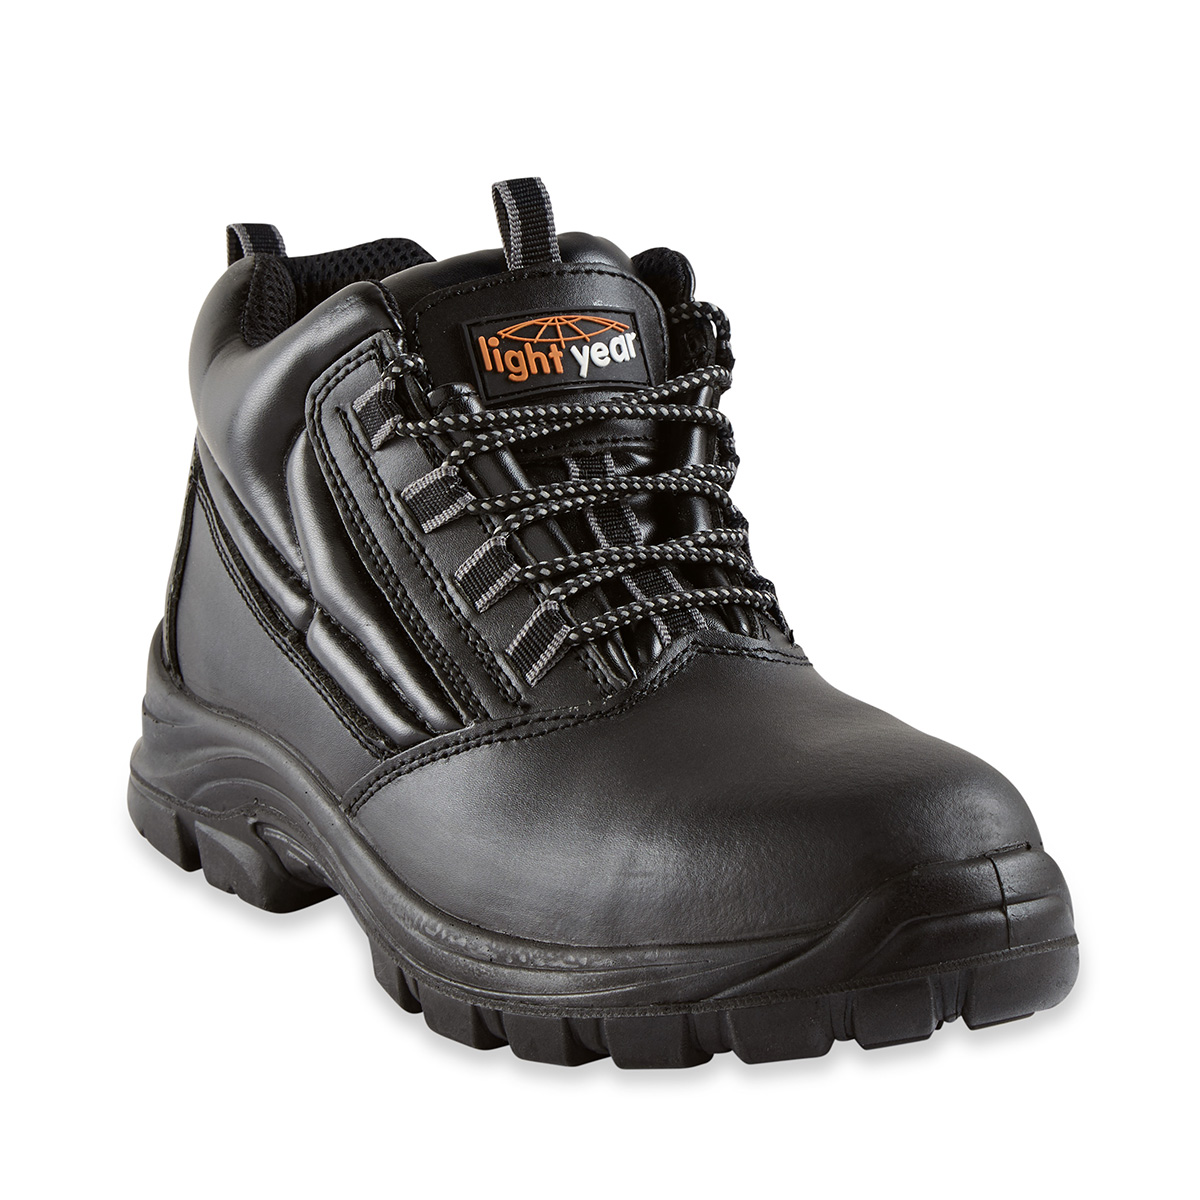 BLK_Trekker_Lightyear_Safety_Boot